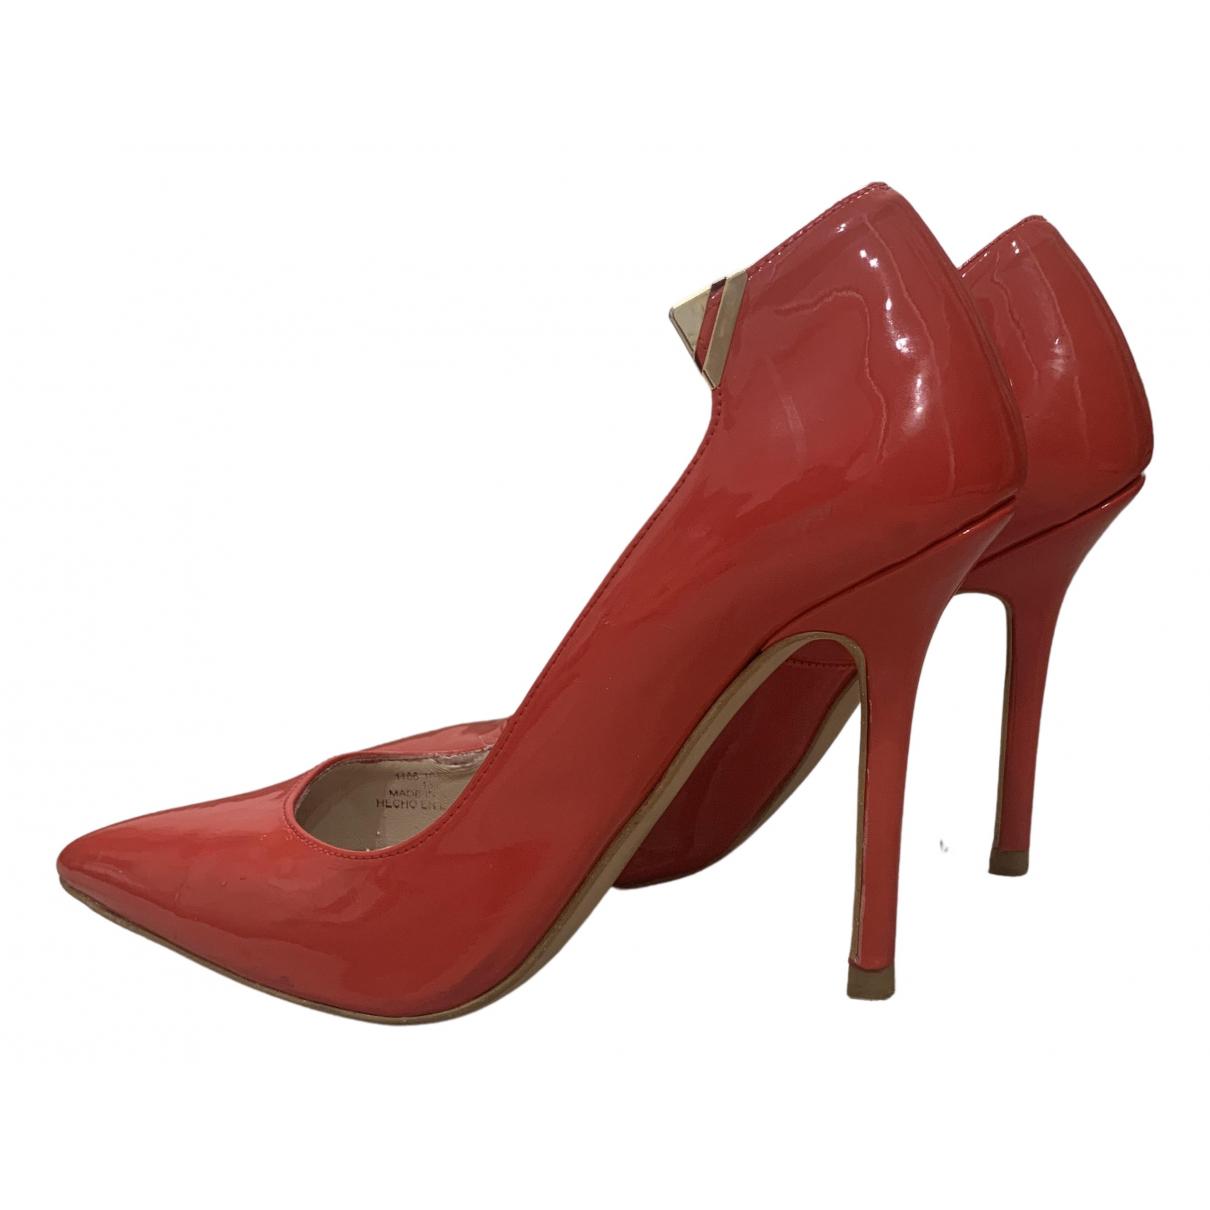 Zara \N Red Patent leather Heels for Women 37 EU